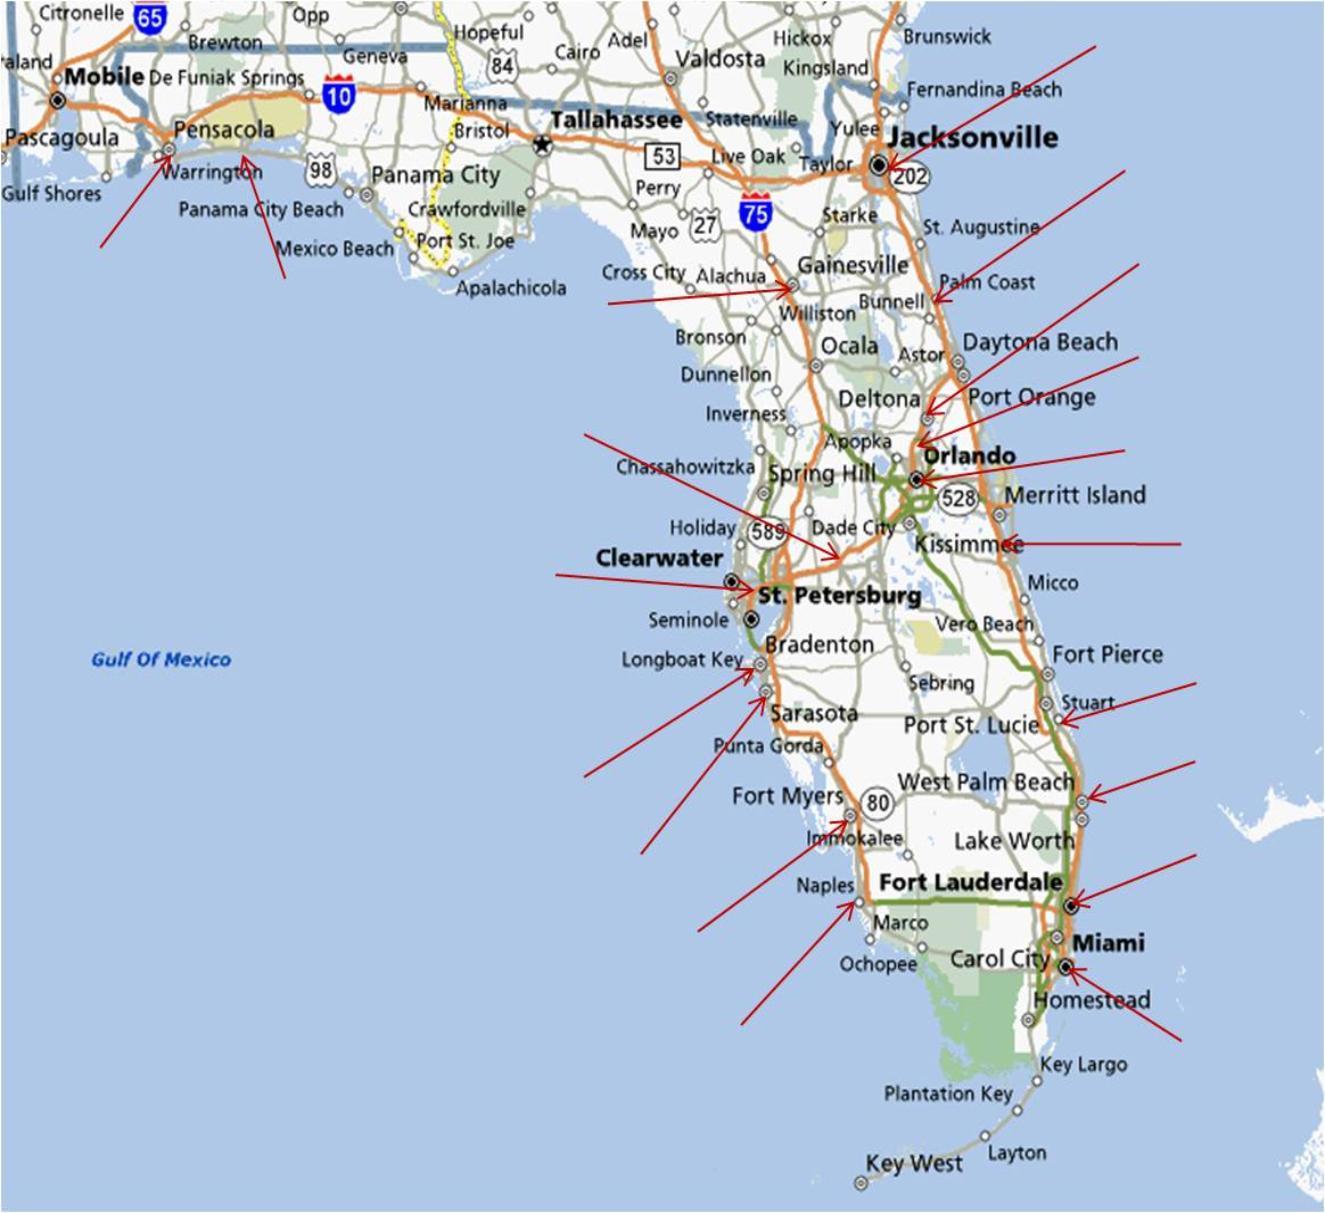 Map Of Florida Running Stores - Palm City Florida Map